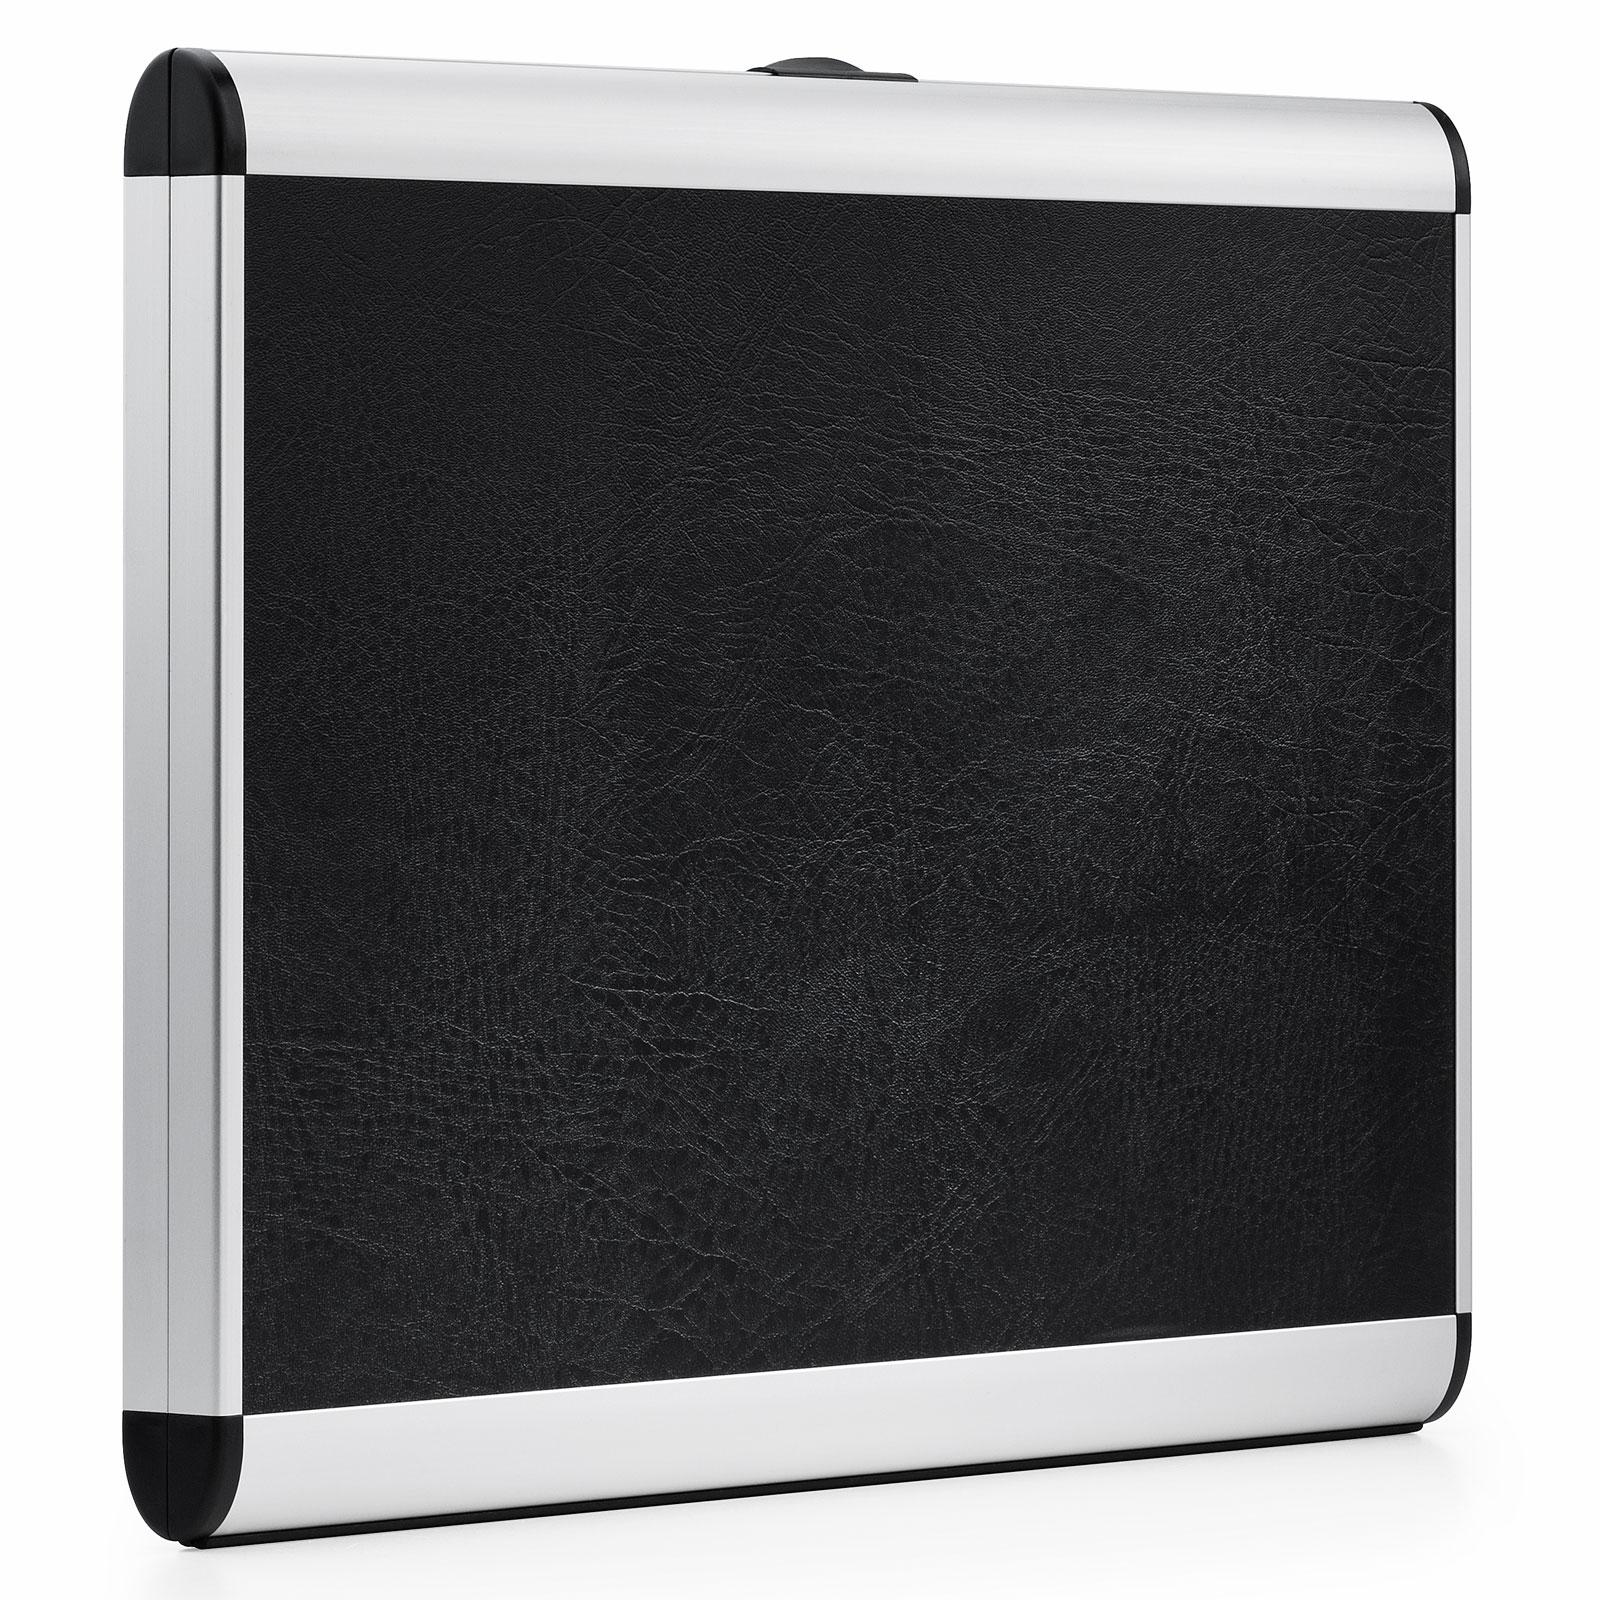 dokumentenmappen g nstig kaufen koffermarkt. Black Bedroom Furniture Sets. Home Design Ideas